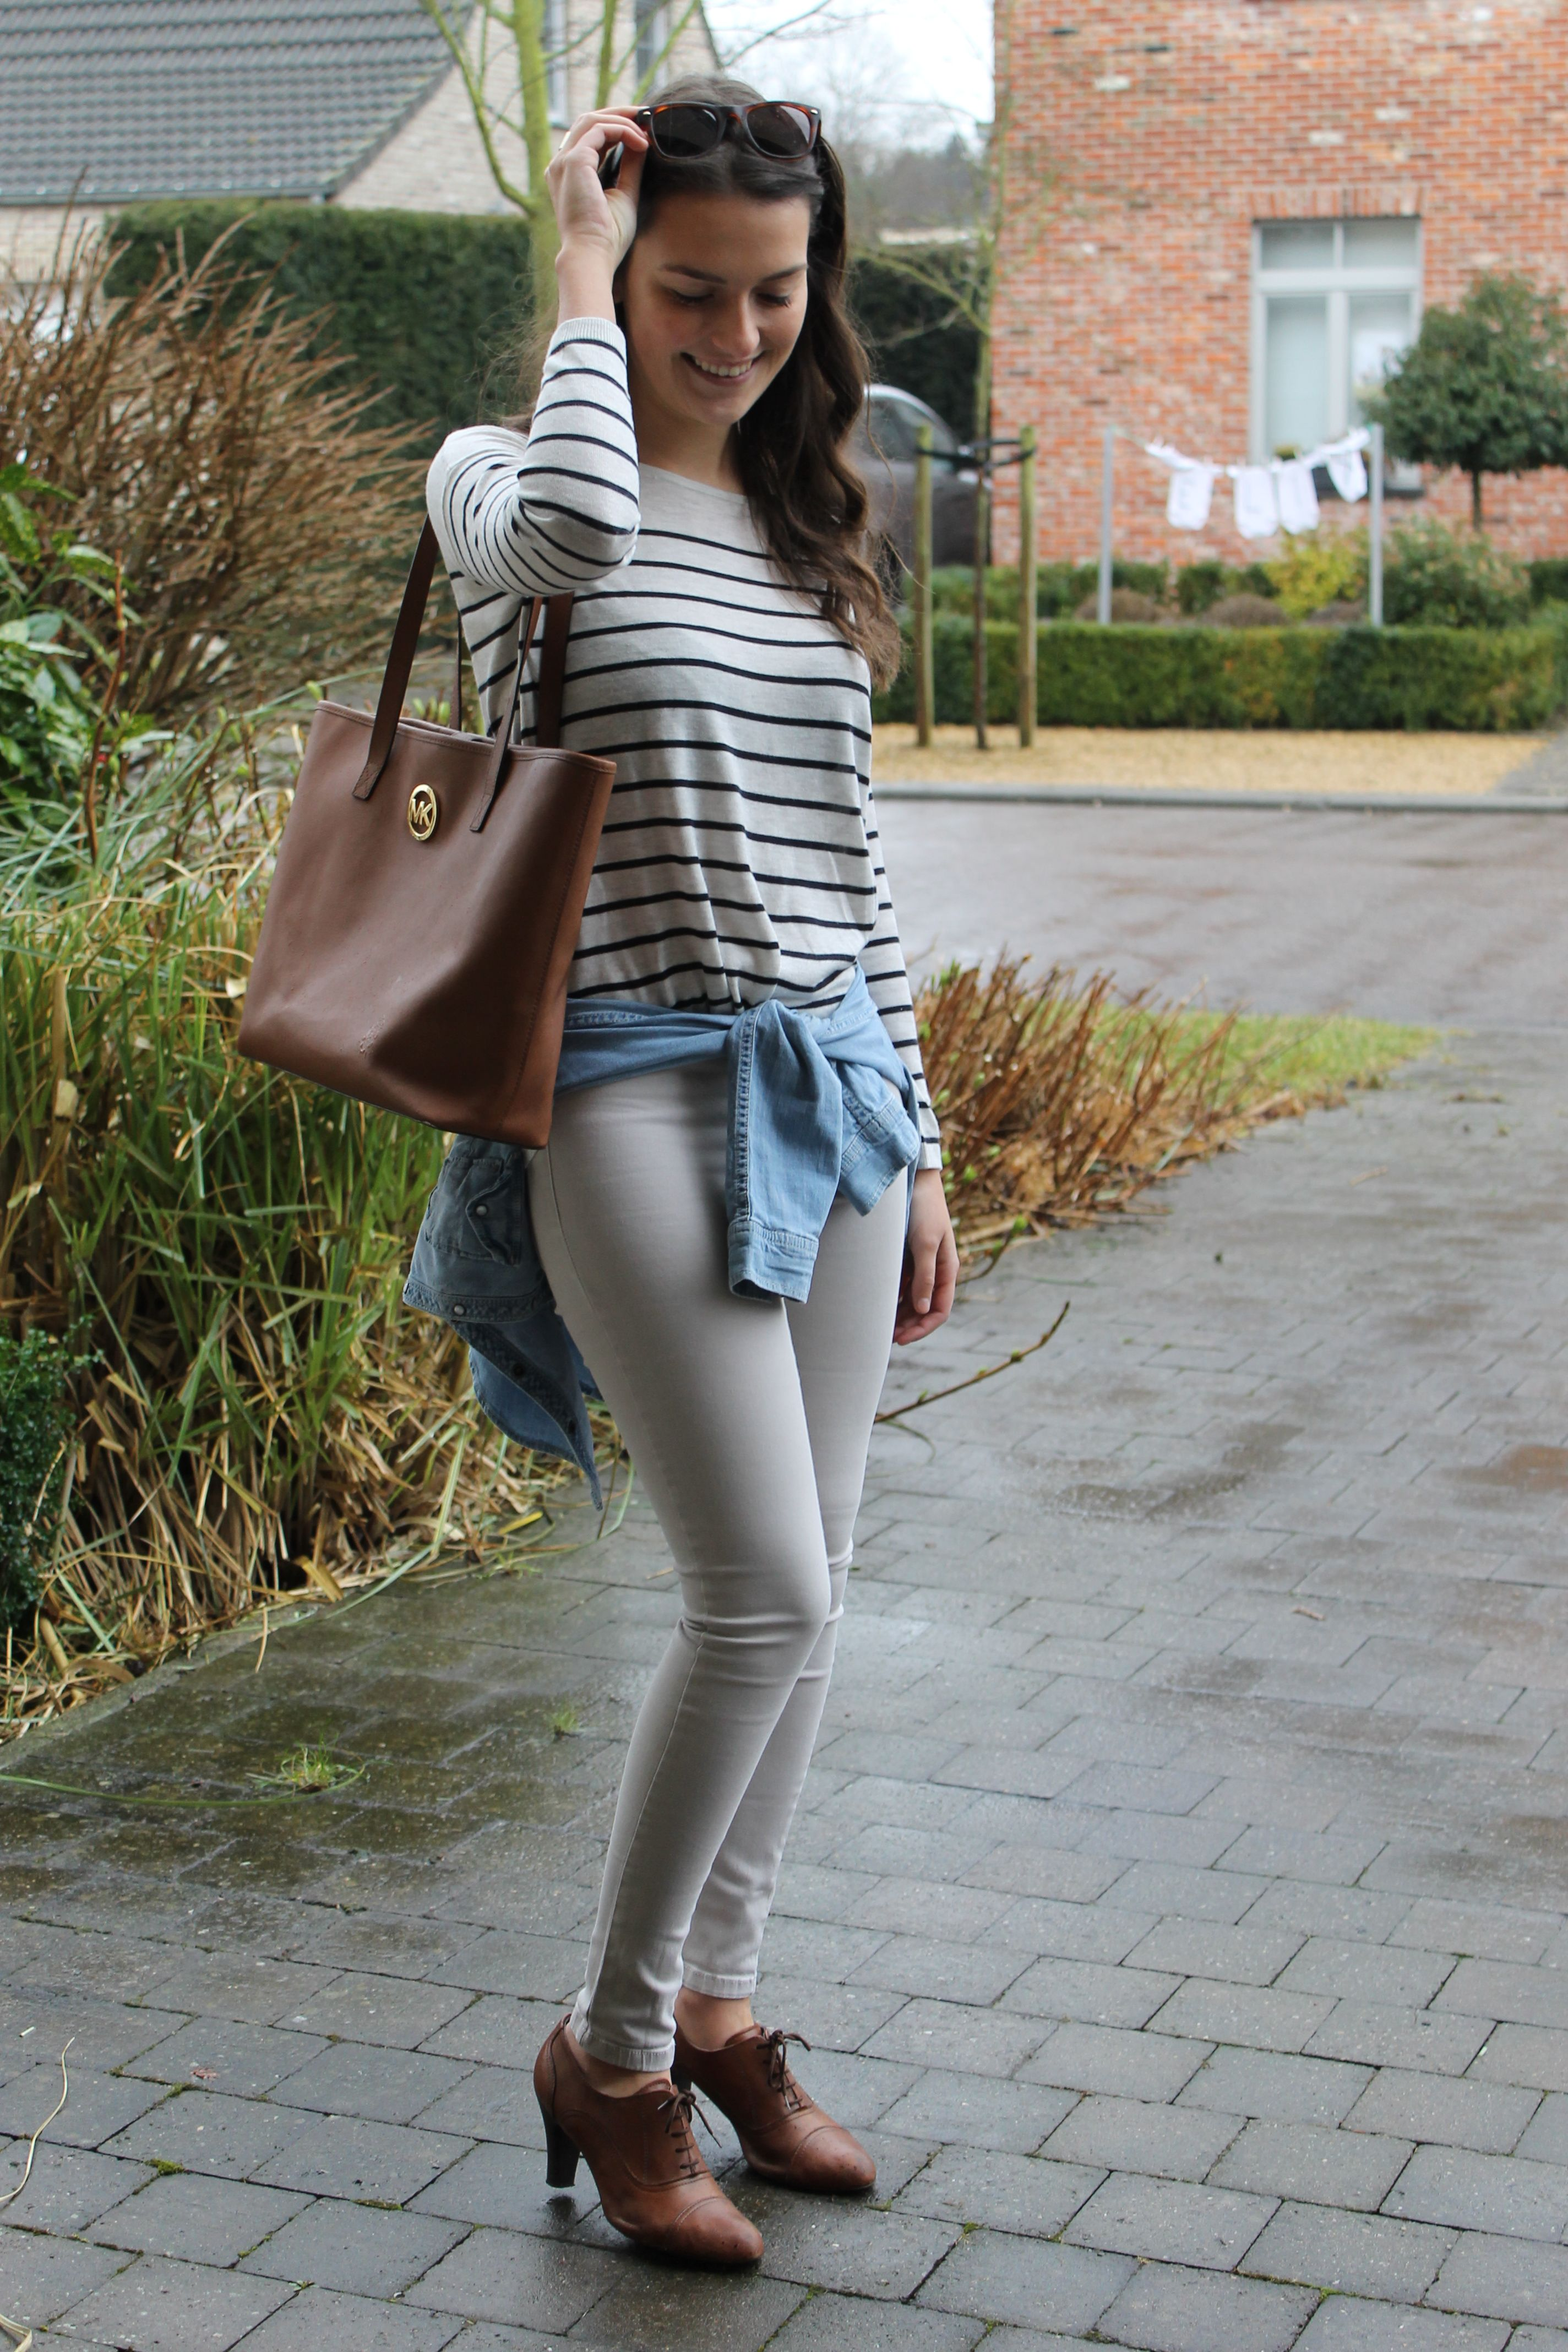 GorisHelena spring fashion blogpost / Michael Kors / striped top / jeans shirt / lace-up shoes